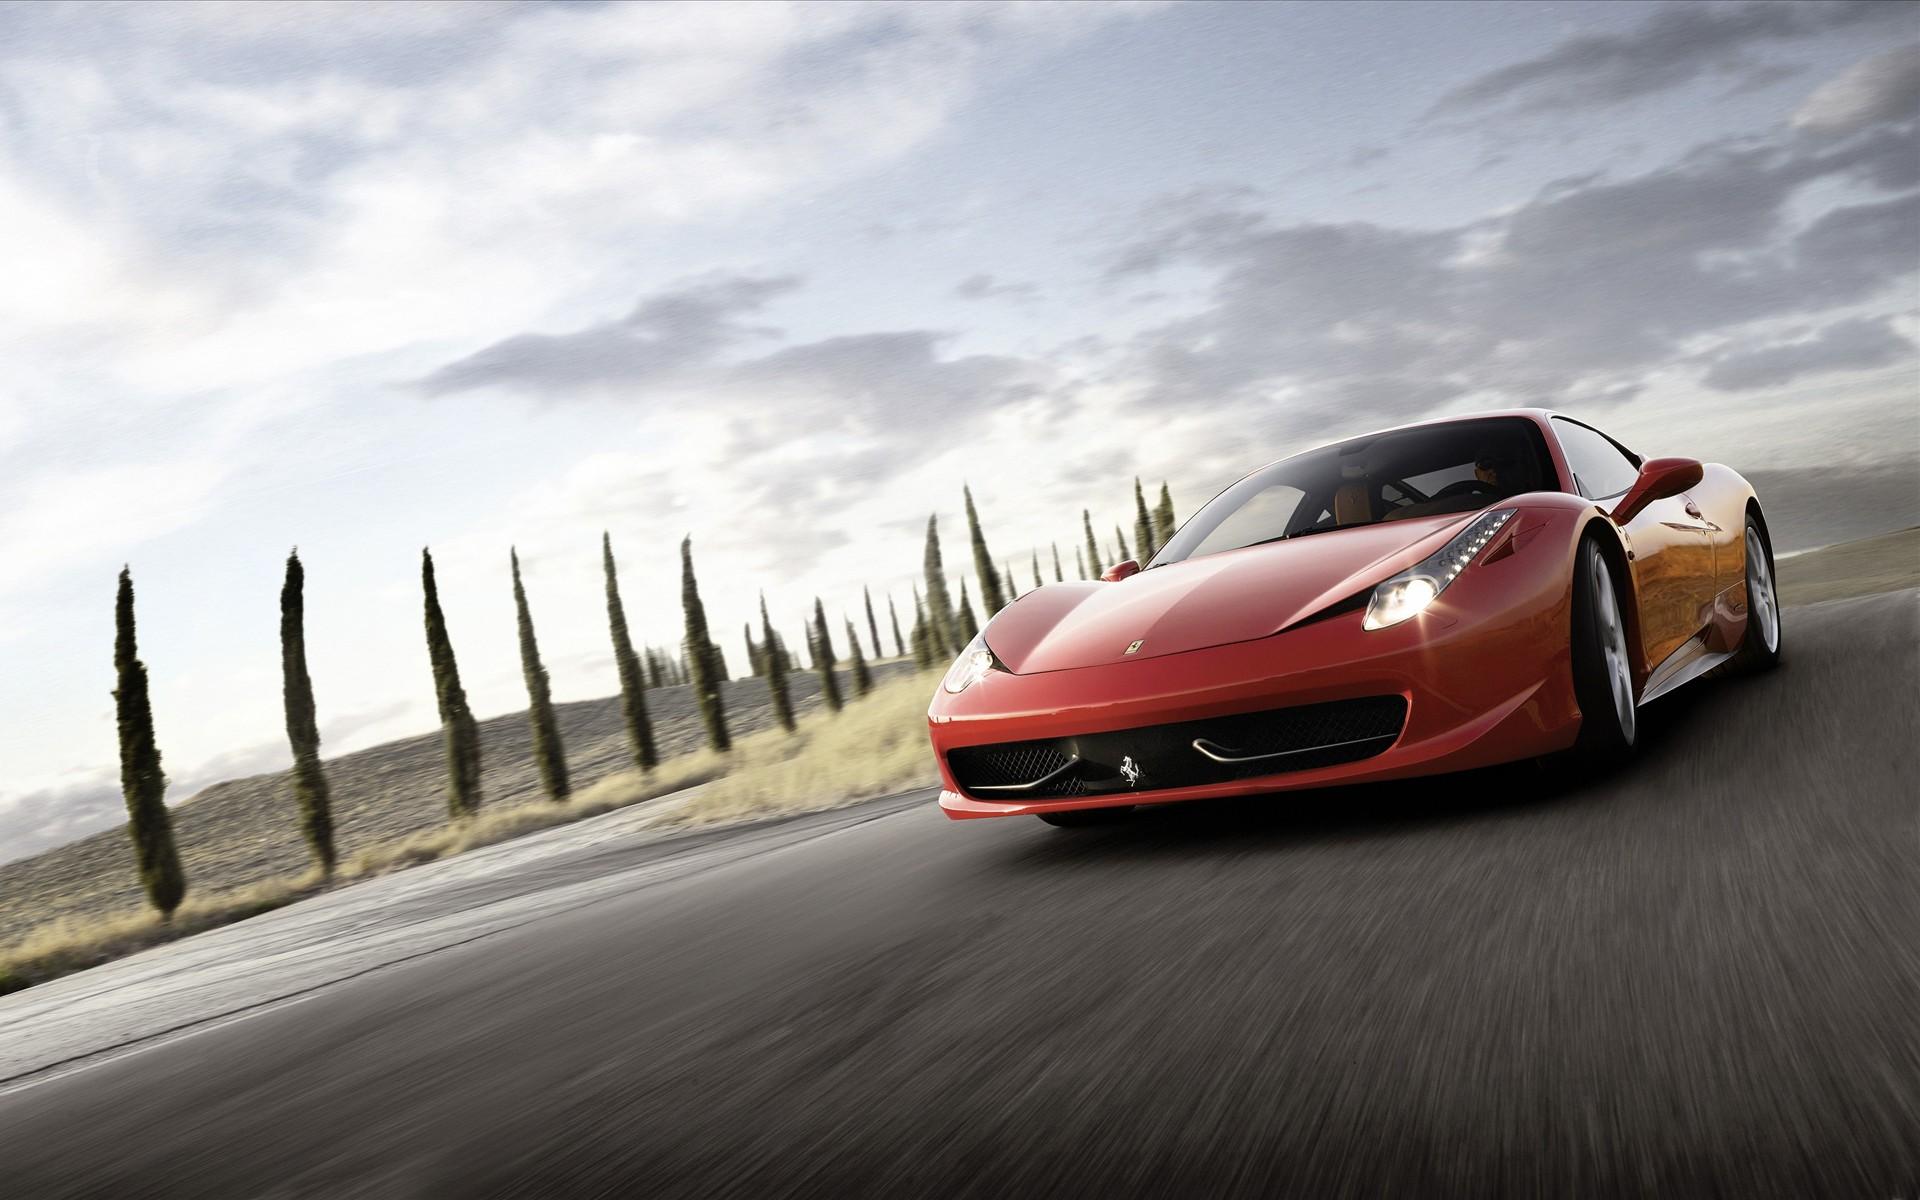 Ferrari 458 Italia Supercar 2 Wallpapers HD Wallpapers 1920x1200